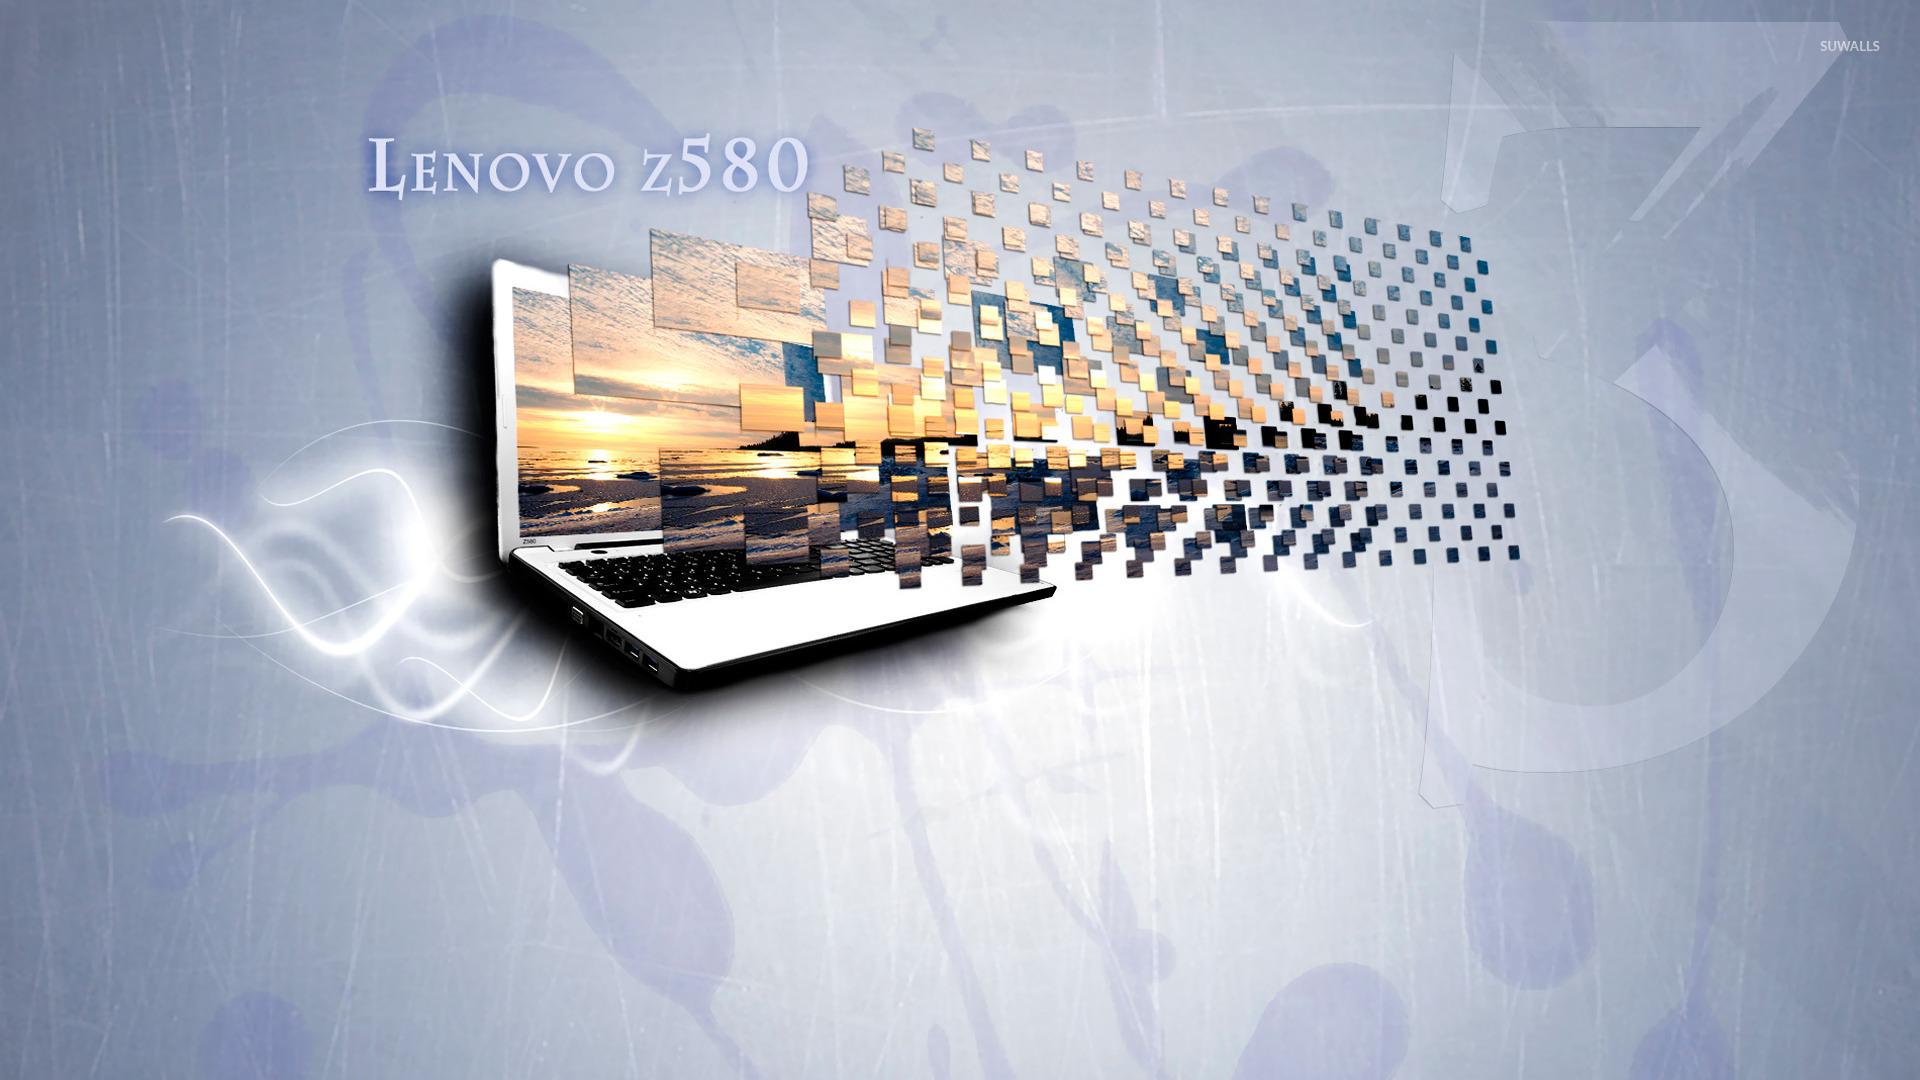 Fall Leave Wallpaper Lenovo Z580 Wallpaper Computer Wallpapers 23271